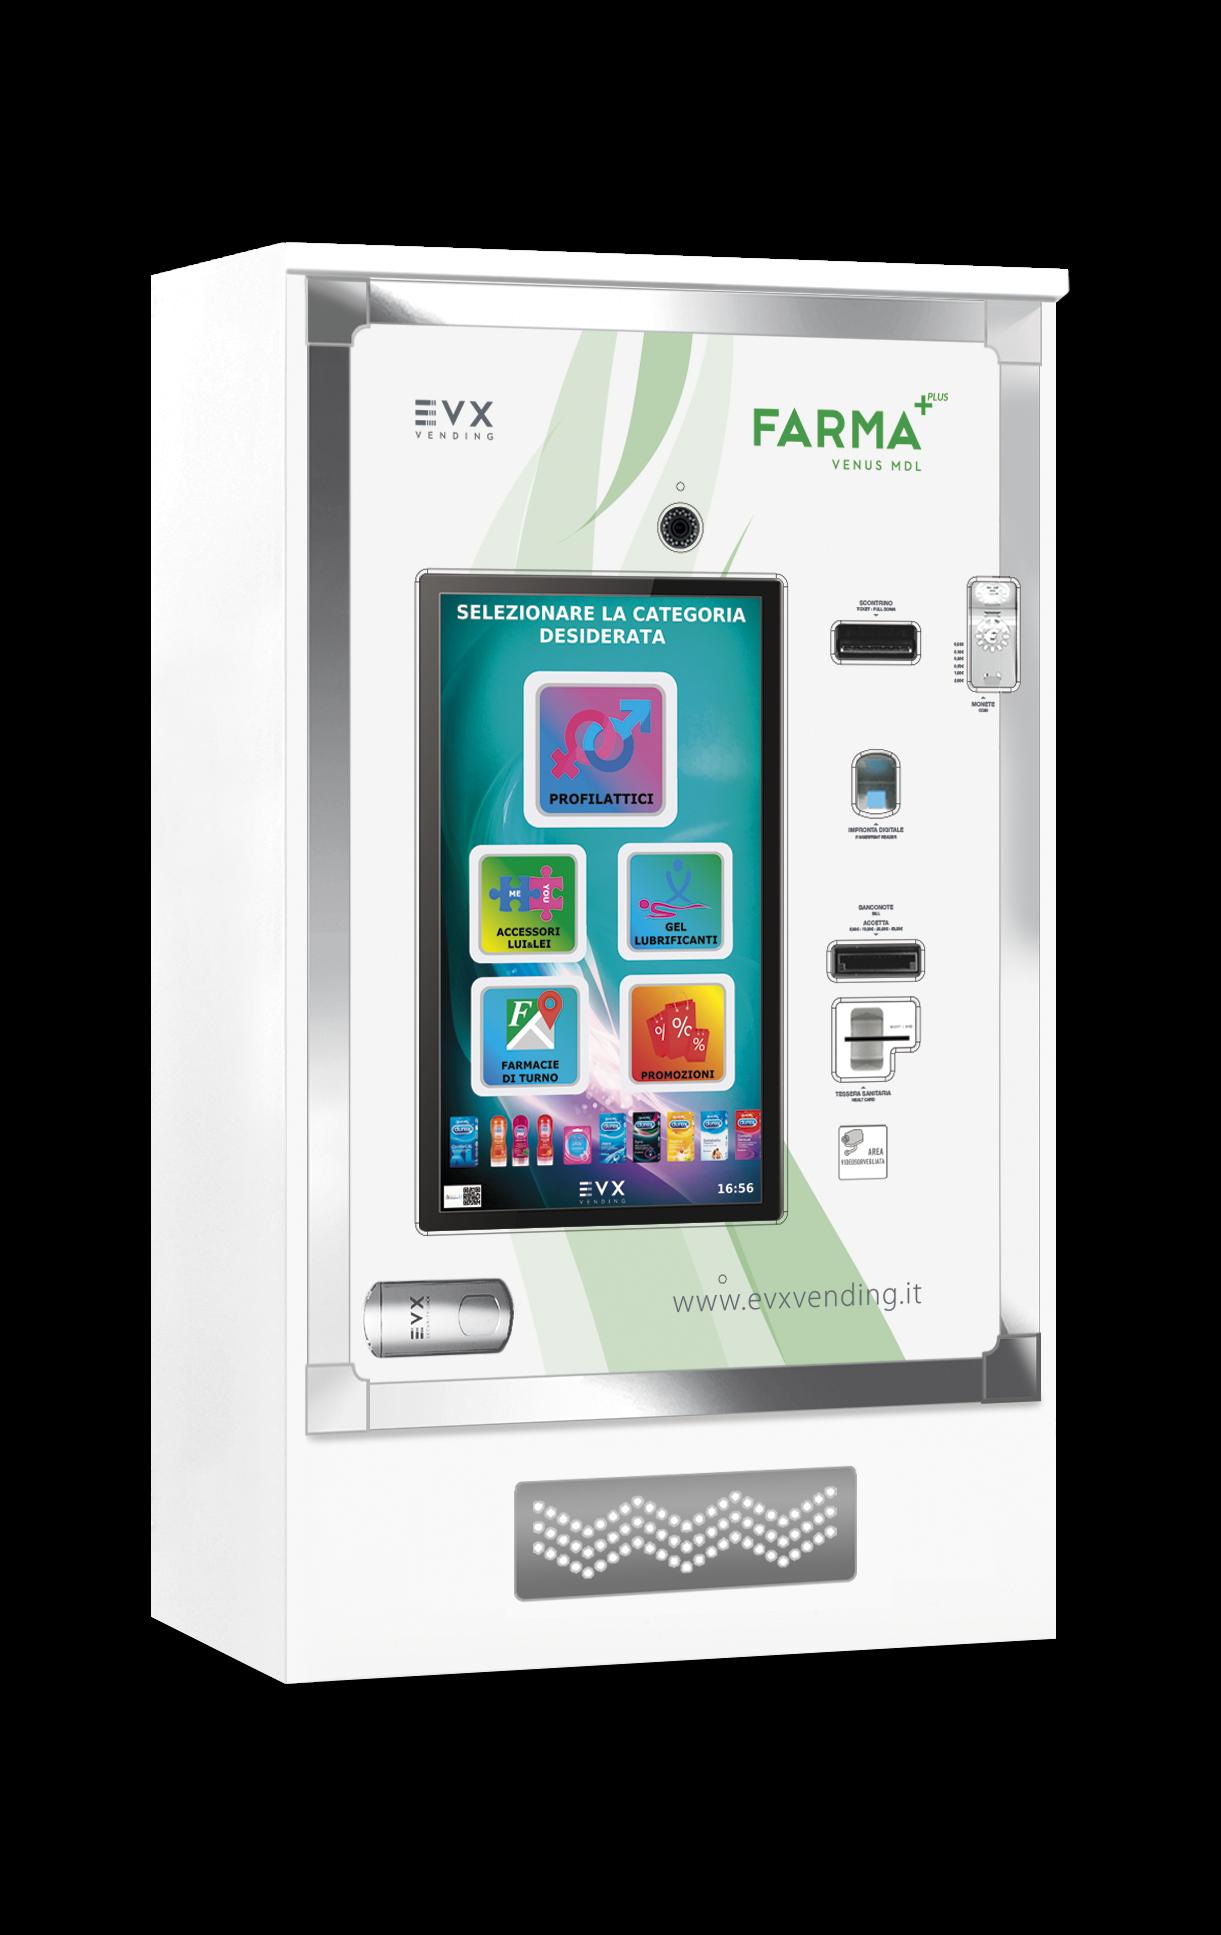 Venus Farma Plus EVX distributore automatico Farmacie